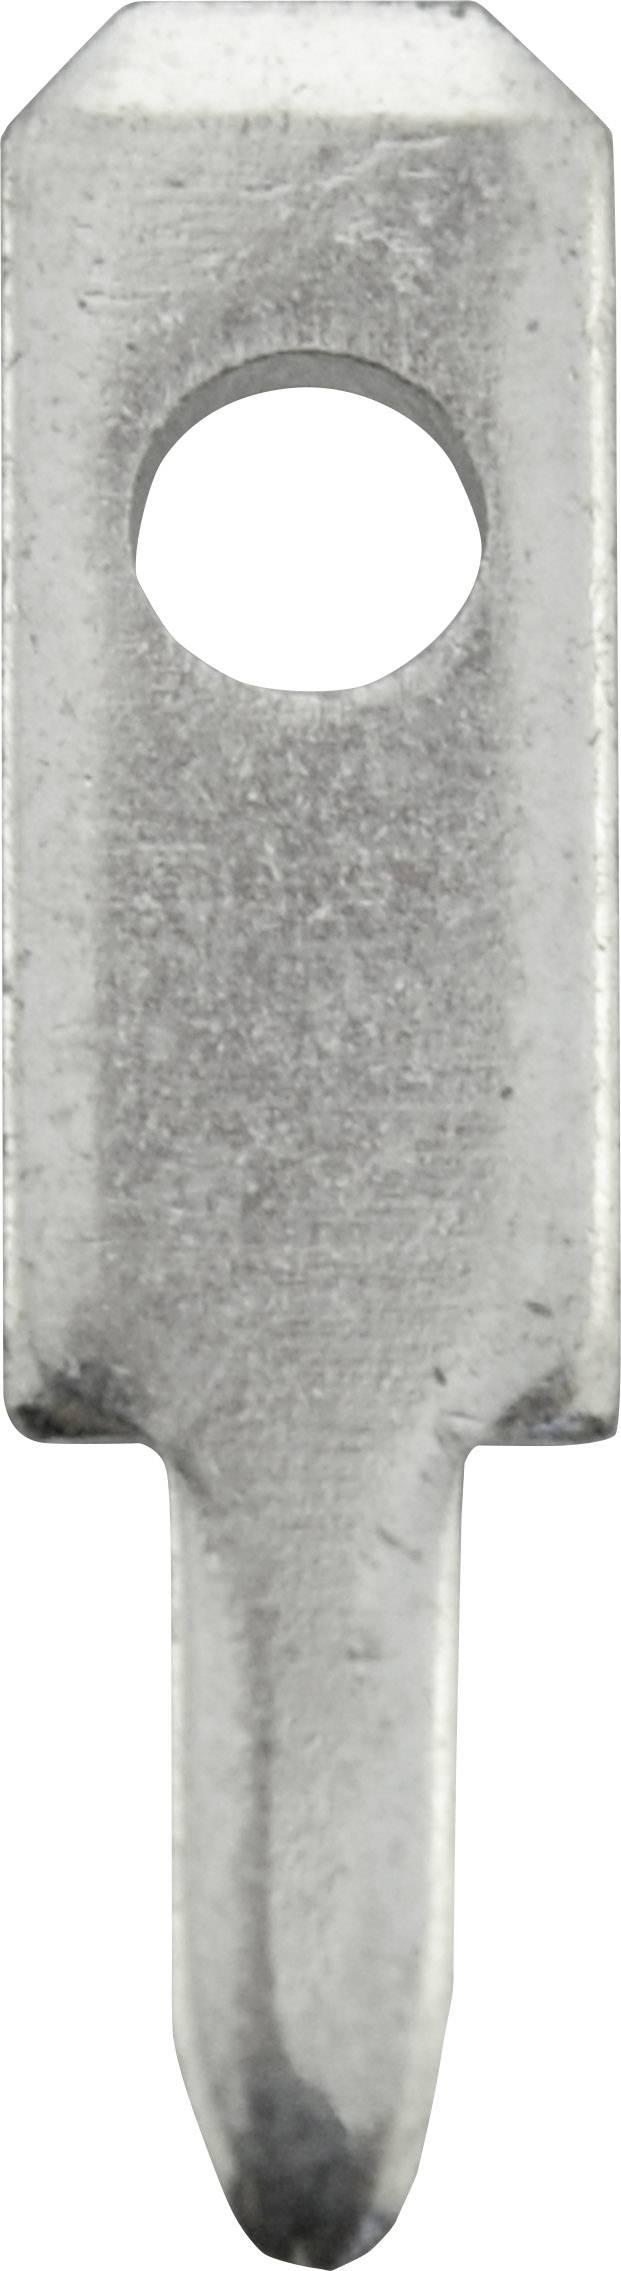 Faston zástrčka Vogt Verbindungstechnik 3780a08.61 2.8 mm x 0.8 mm, 180 °, bez izolace, kov, 100 ks